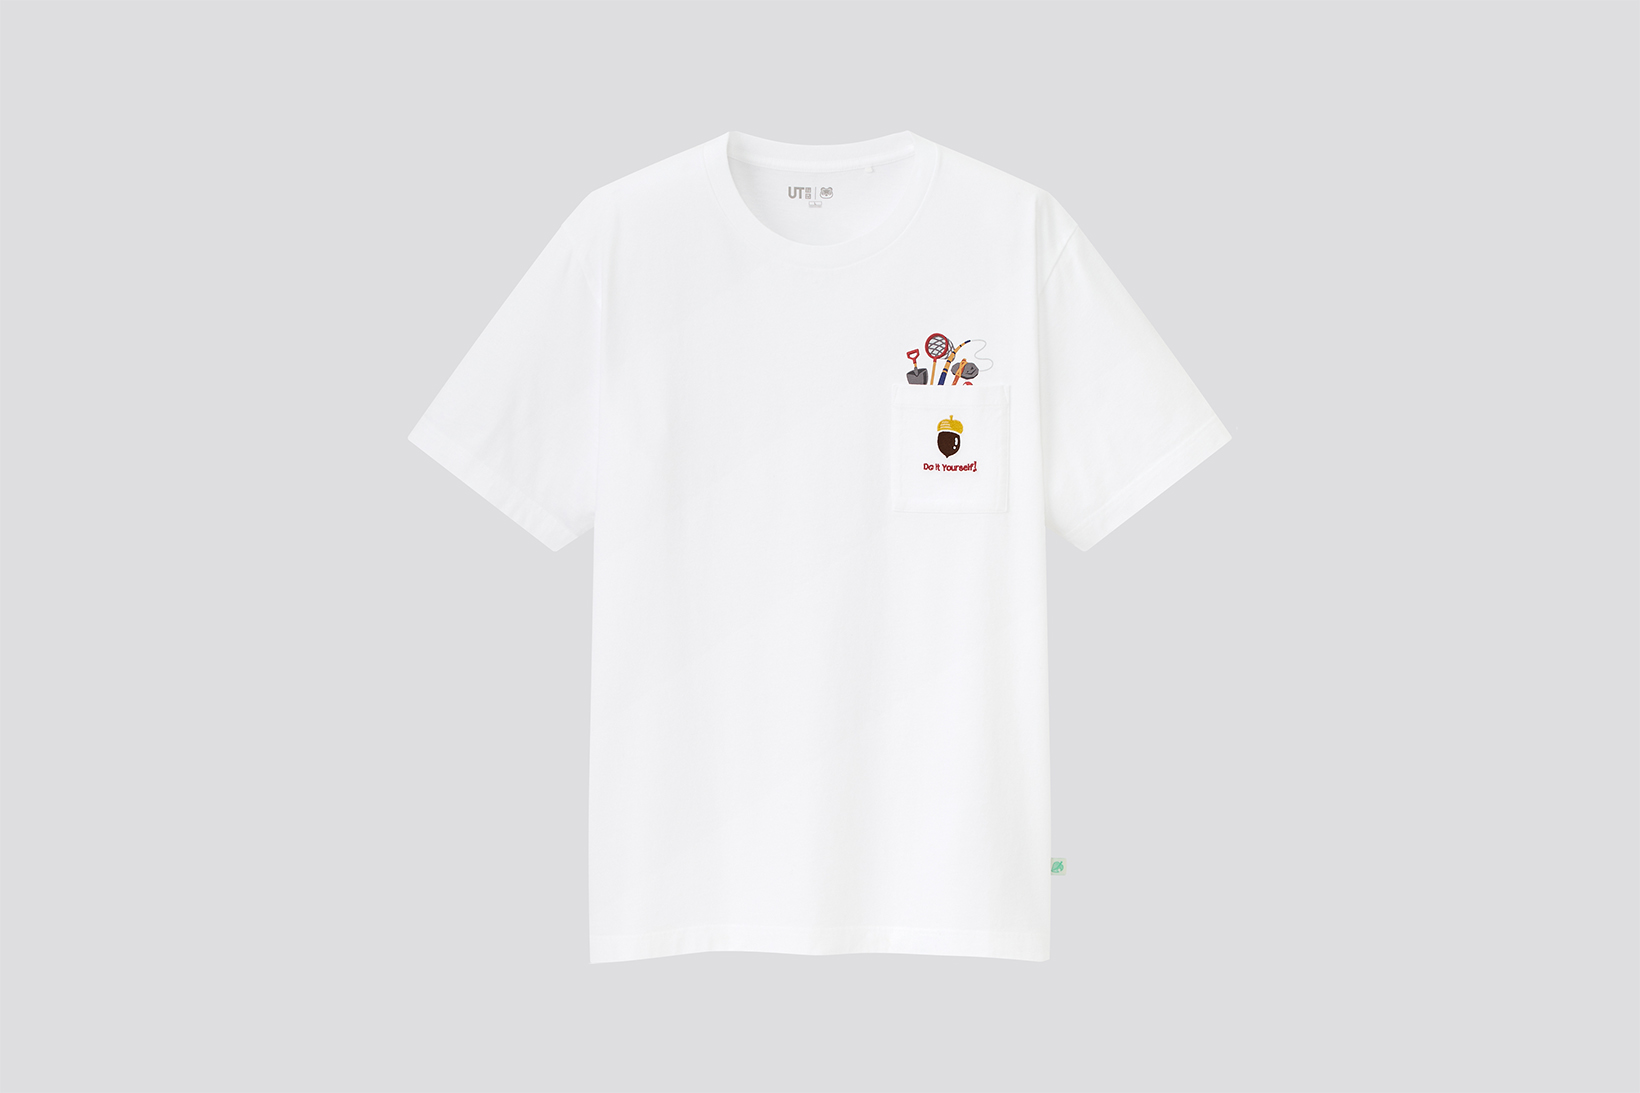 Uniqlo UT Animal Crossing New Horizons